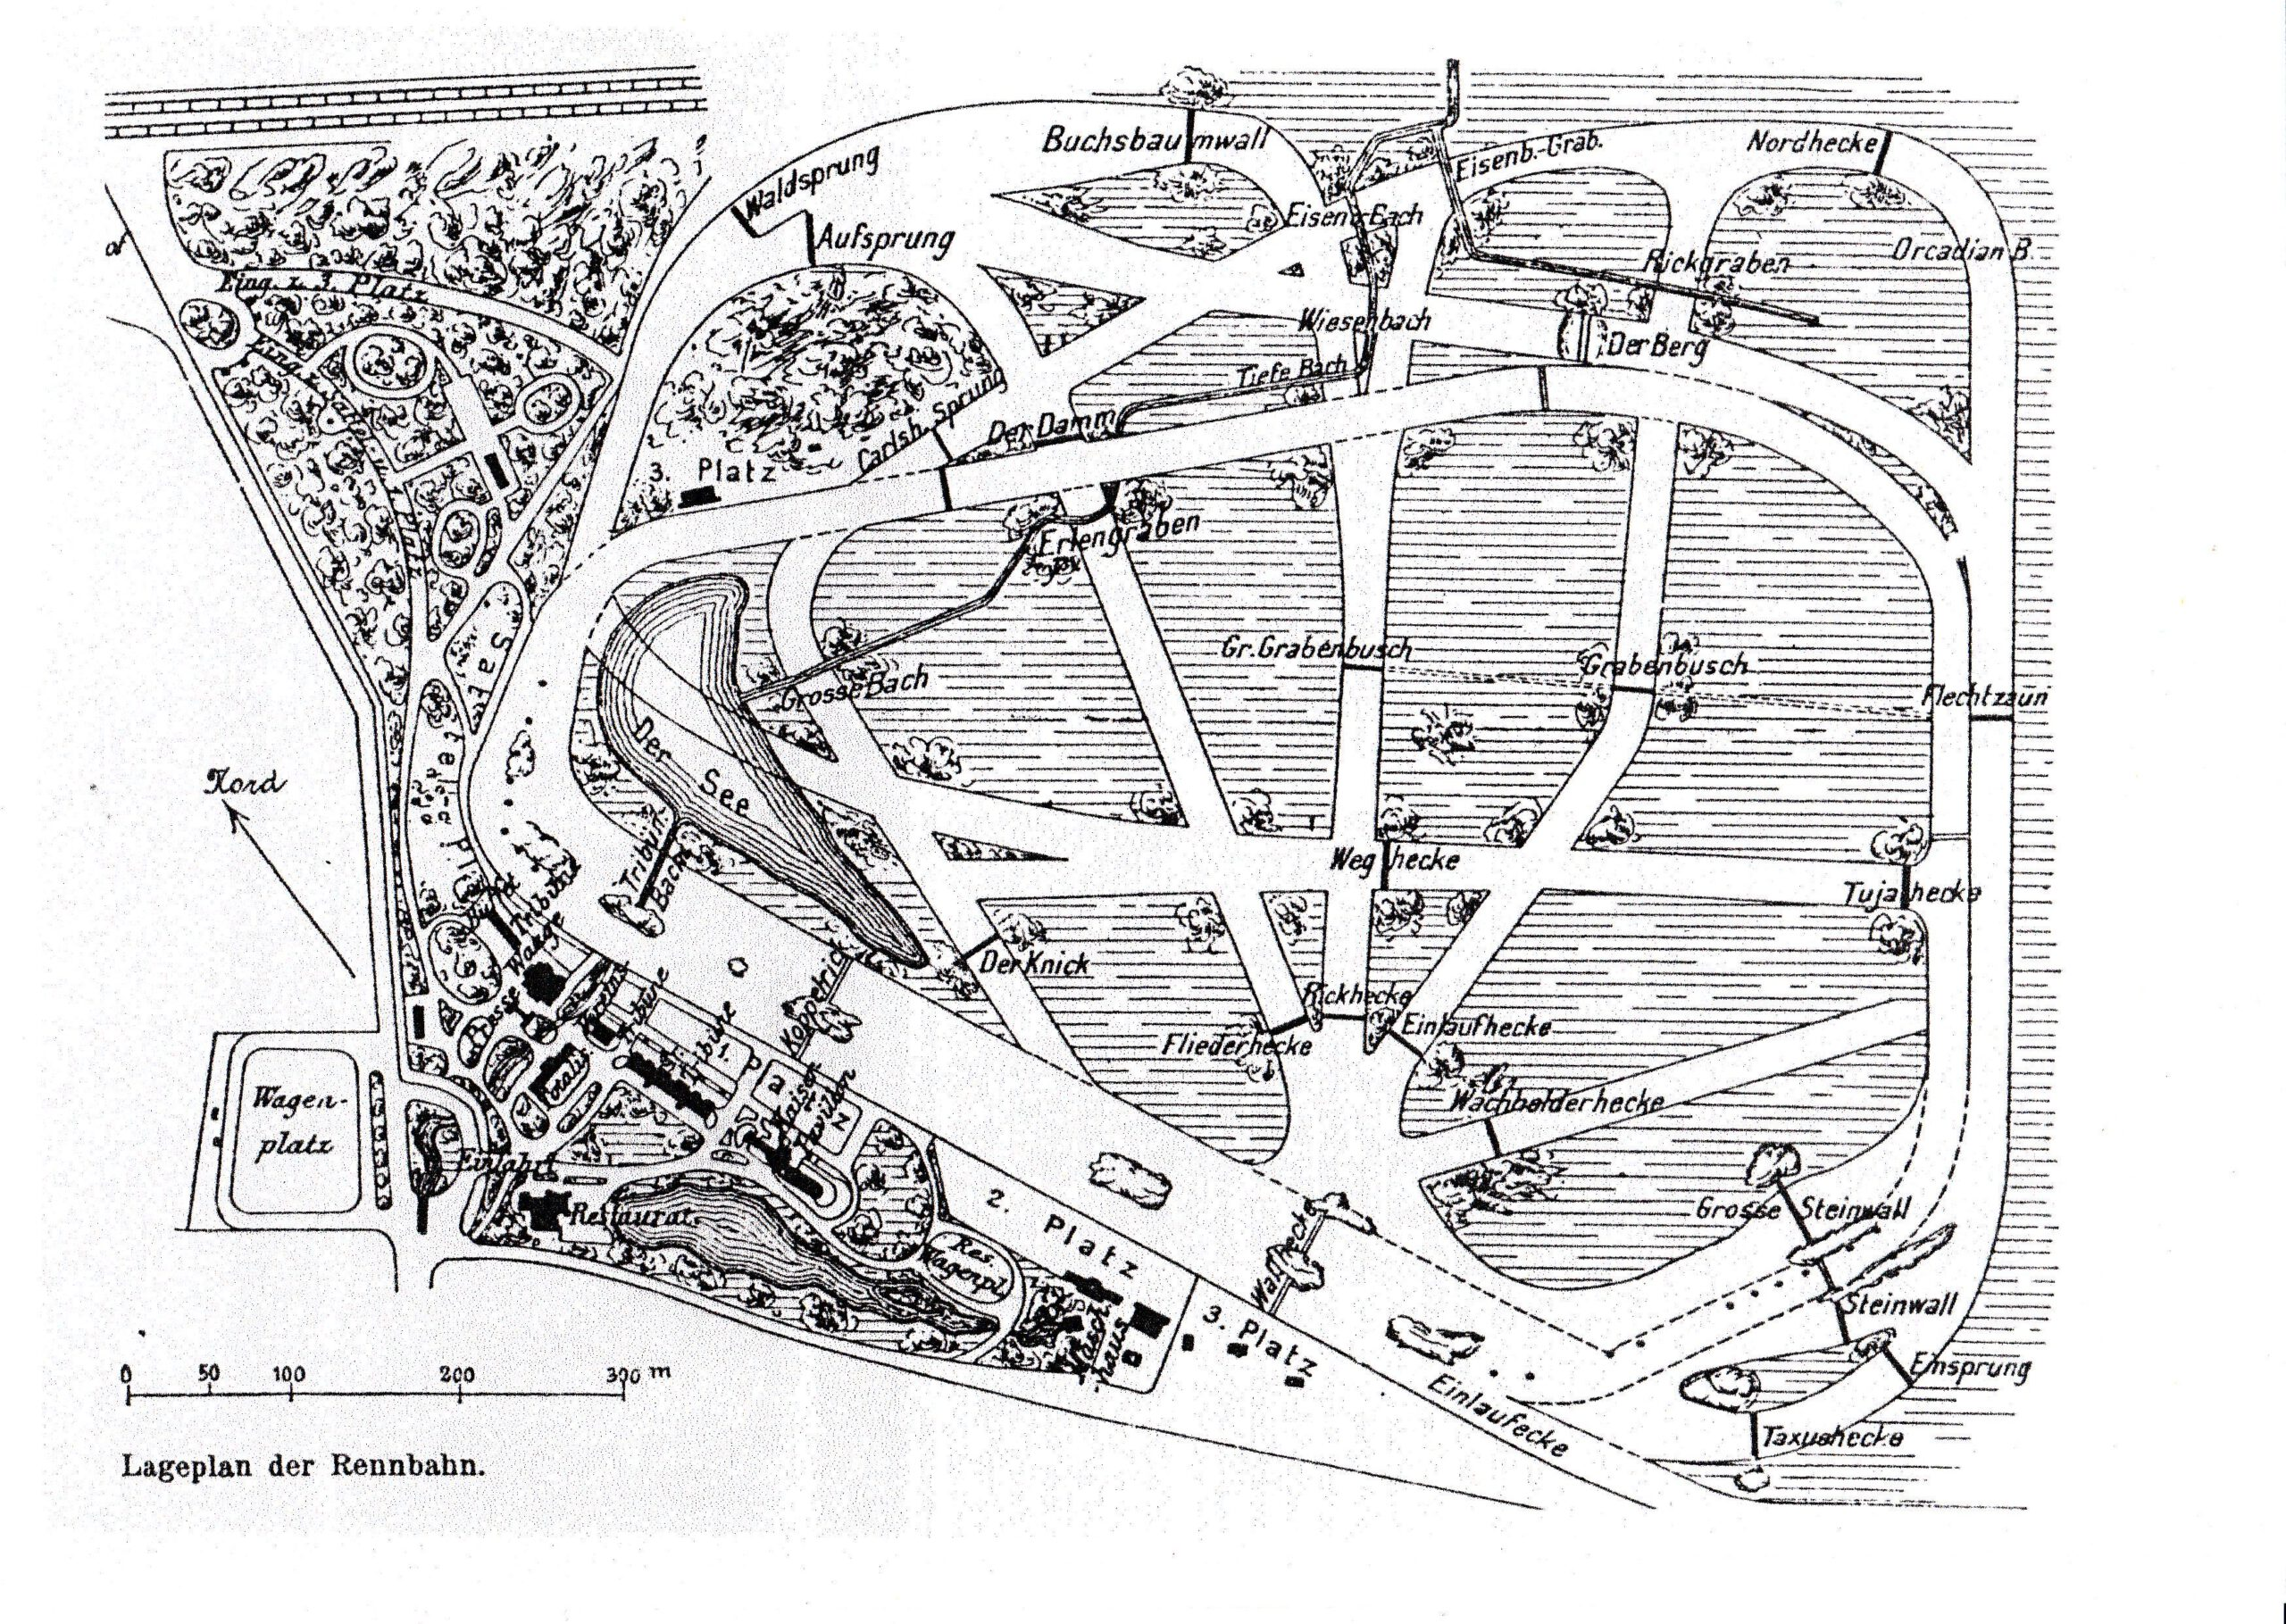 Hindernissbahn-scaled.jpg